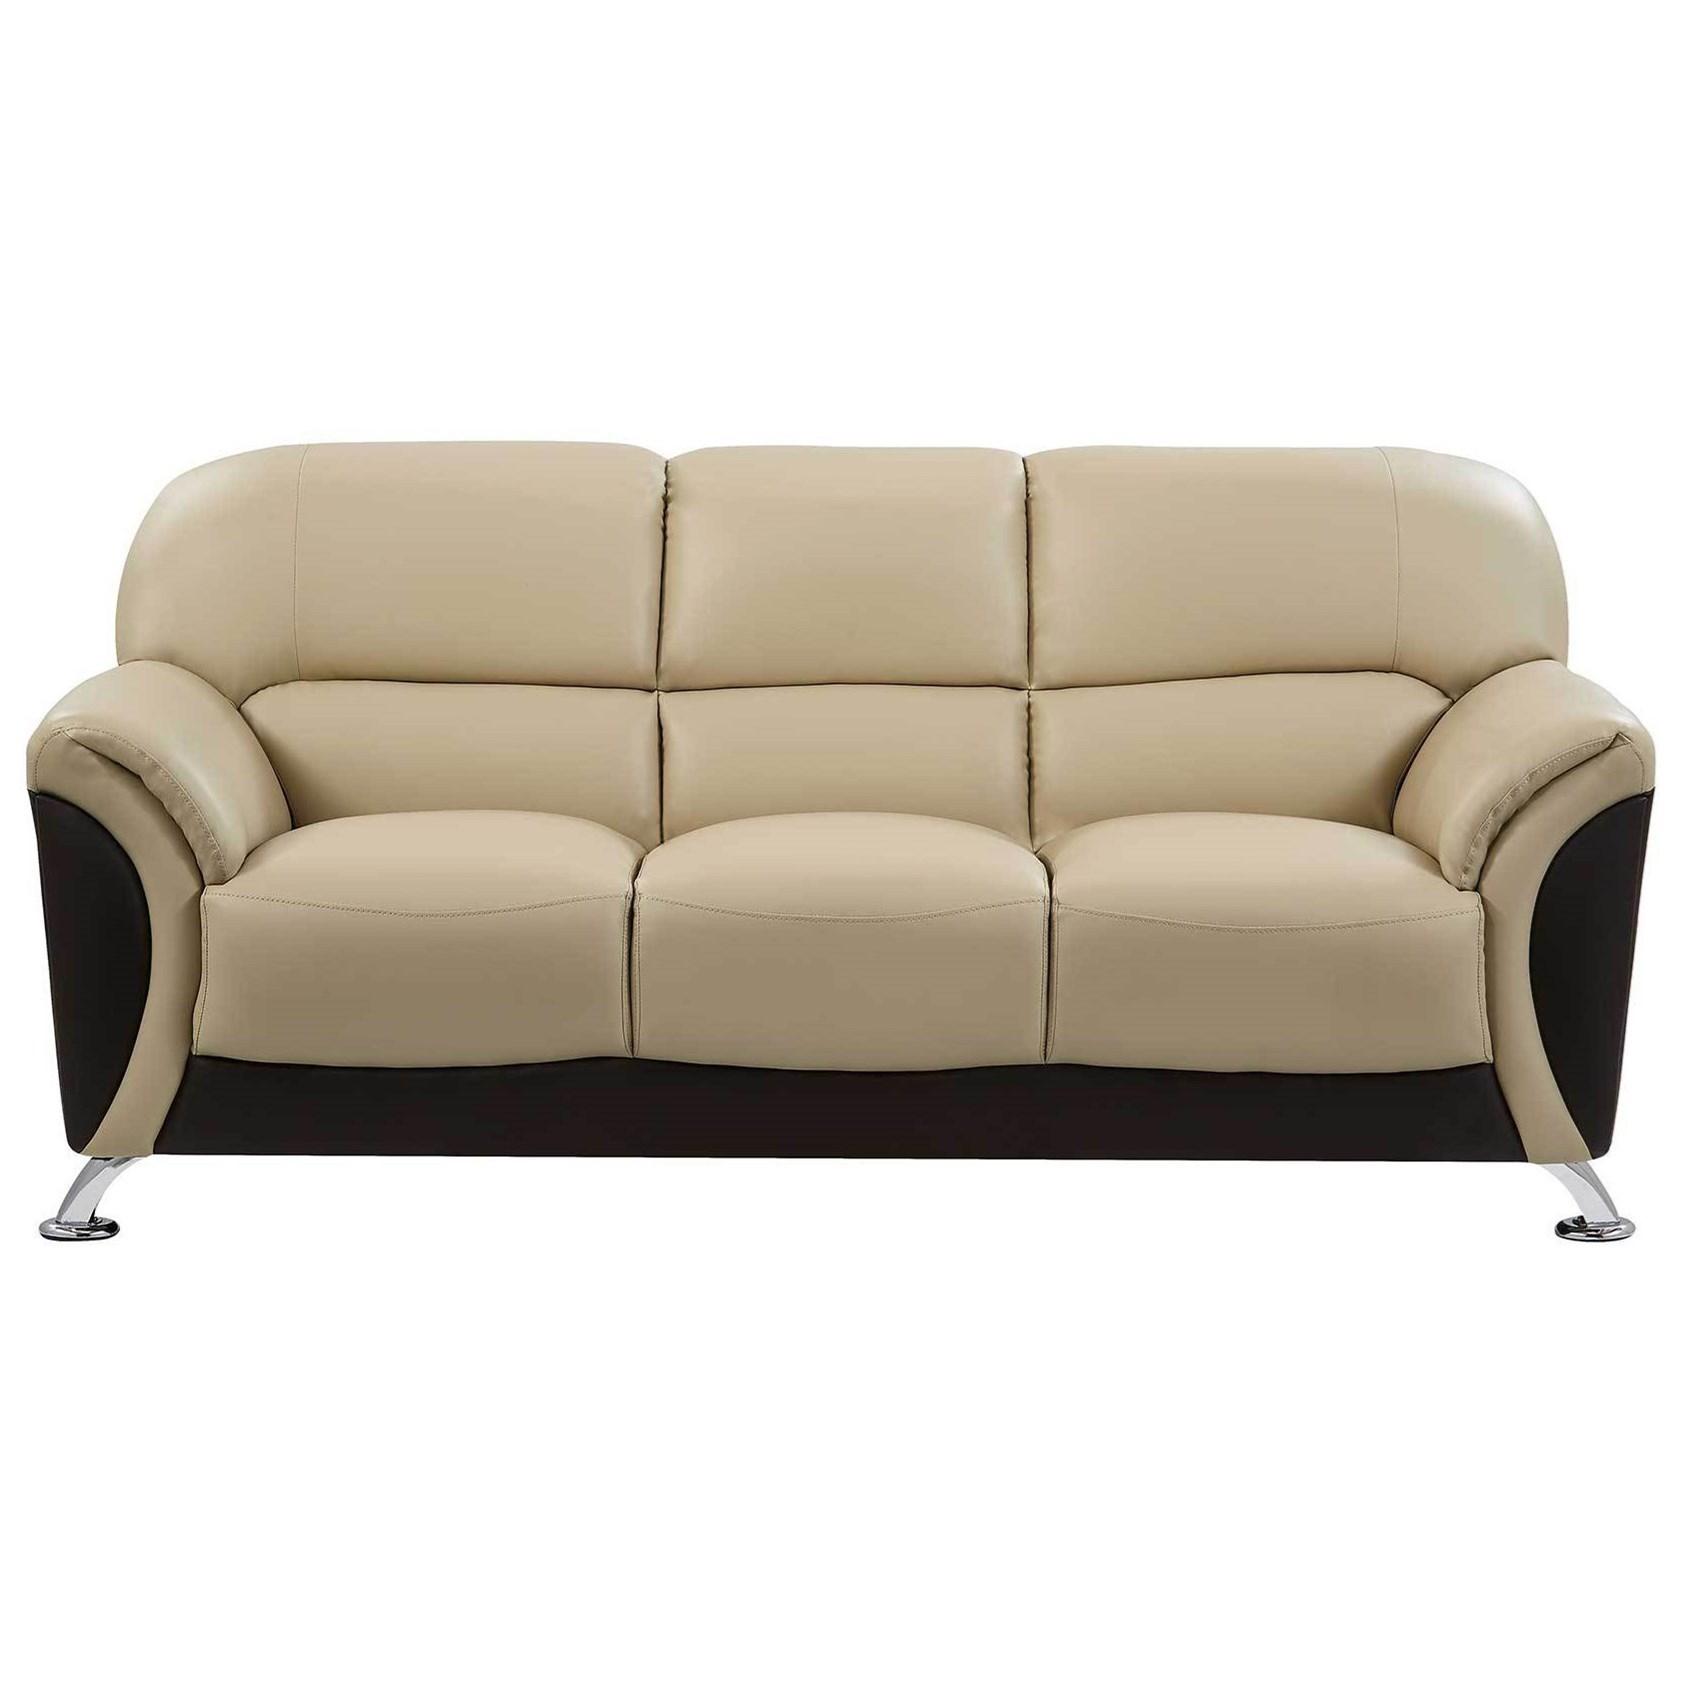 Value City NJ Furniture